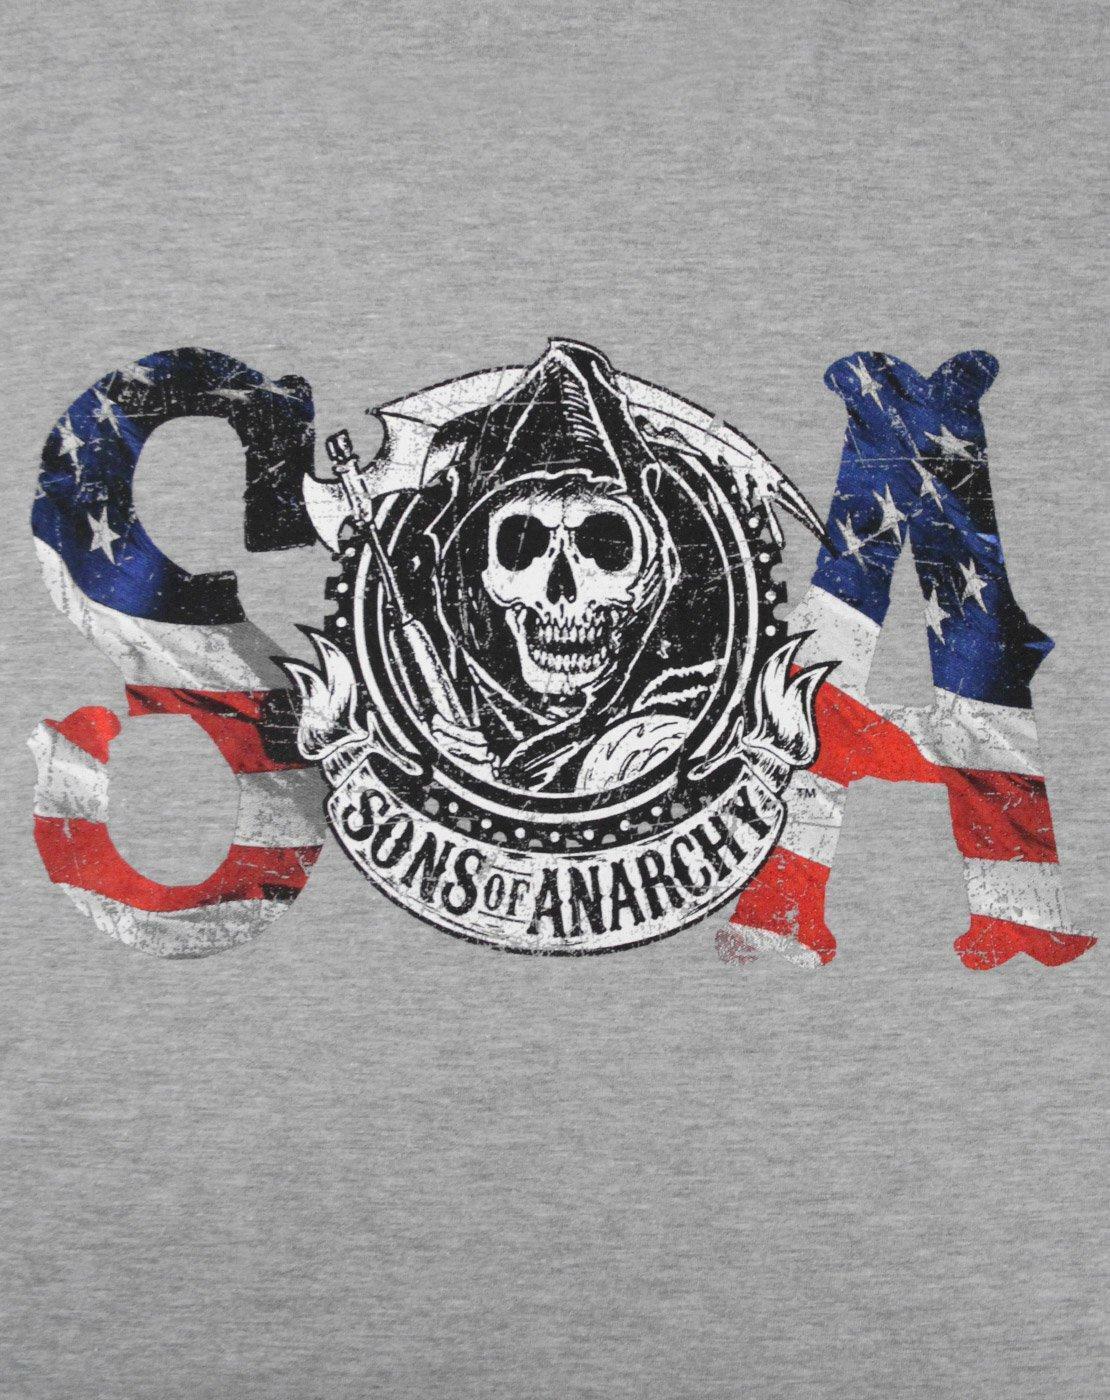 Sons-Of-Anarchy-Flag-Men-039-s-T-Shirt miniatuur 6